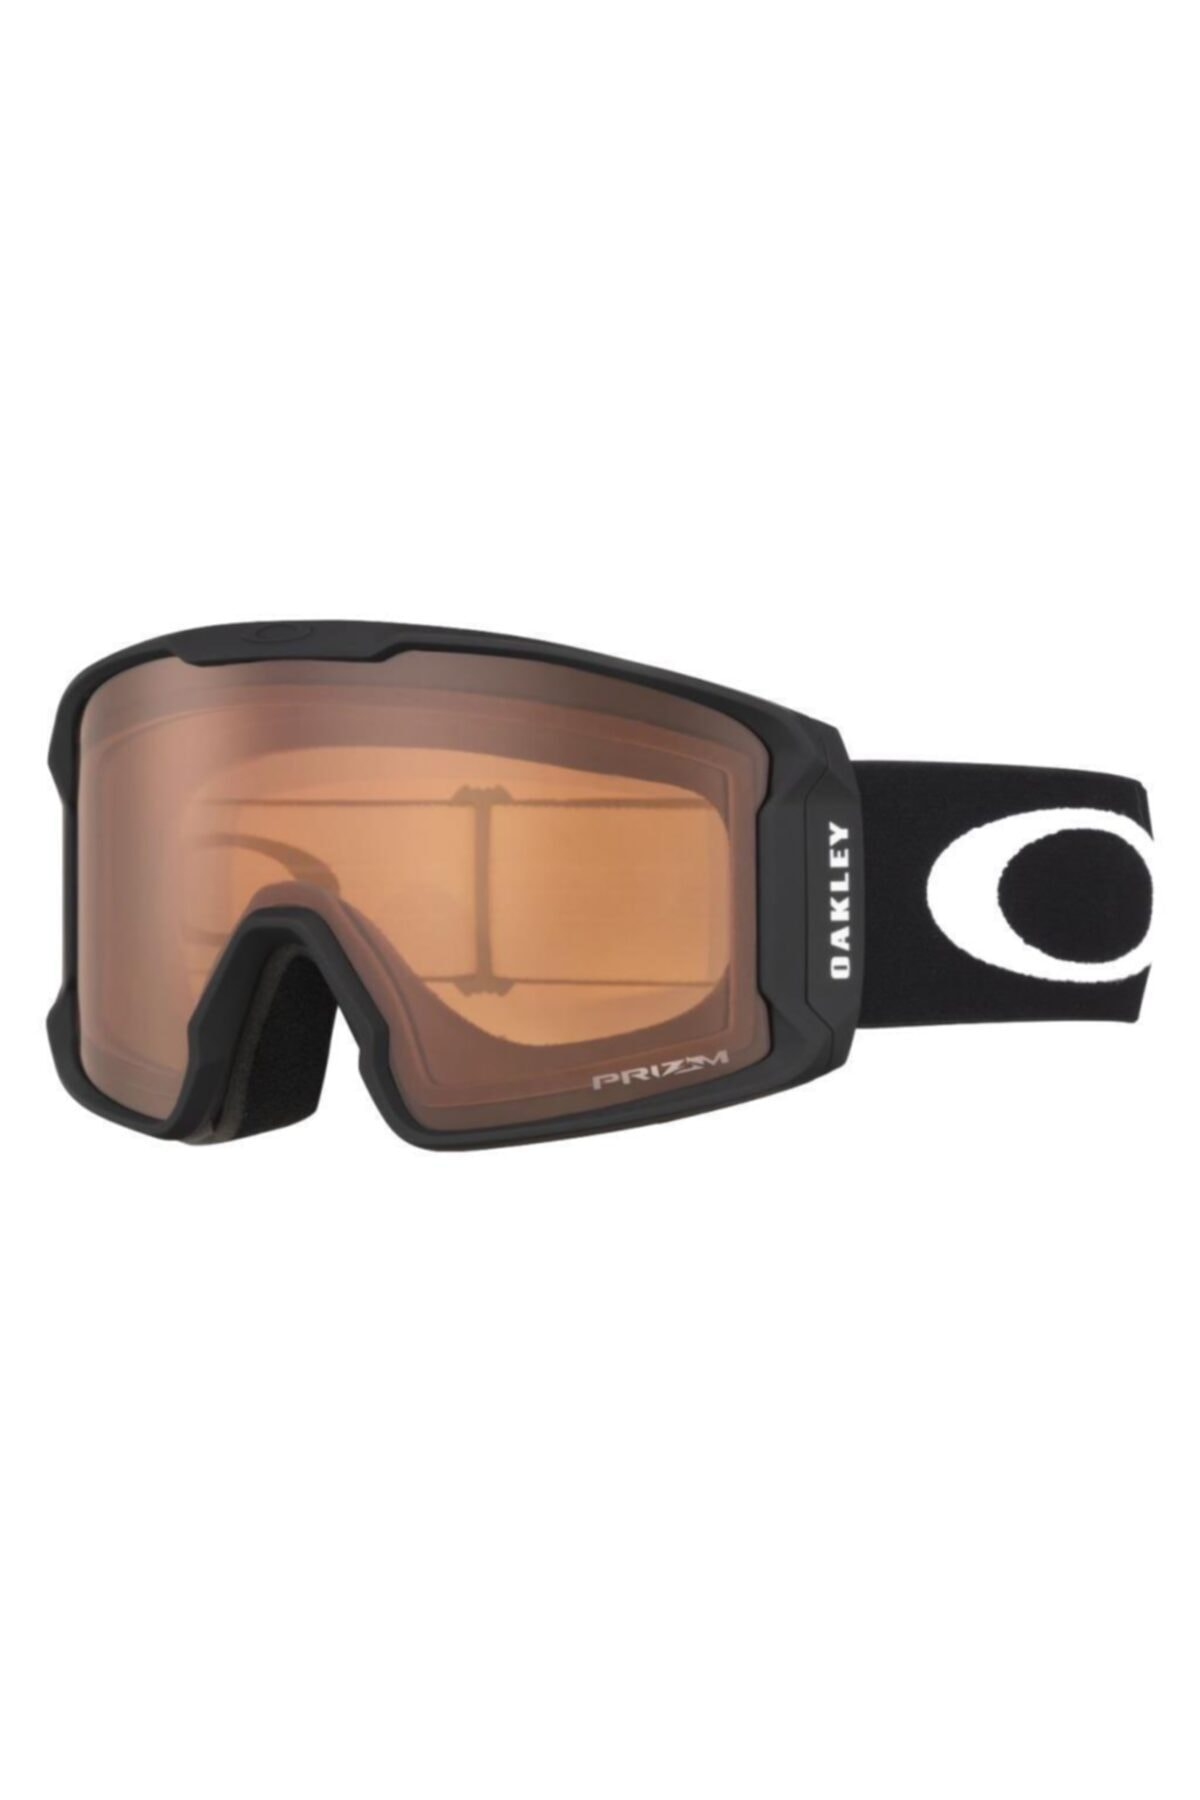 Oakley Oo7070 Lıne Mıner Xl 5701 Prızm Kayak Gözlüğü 1